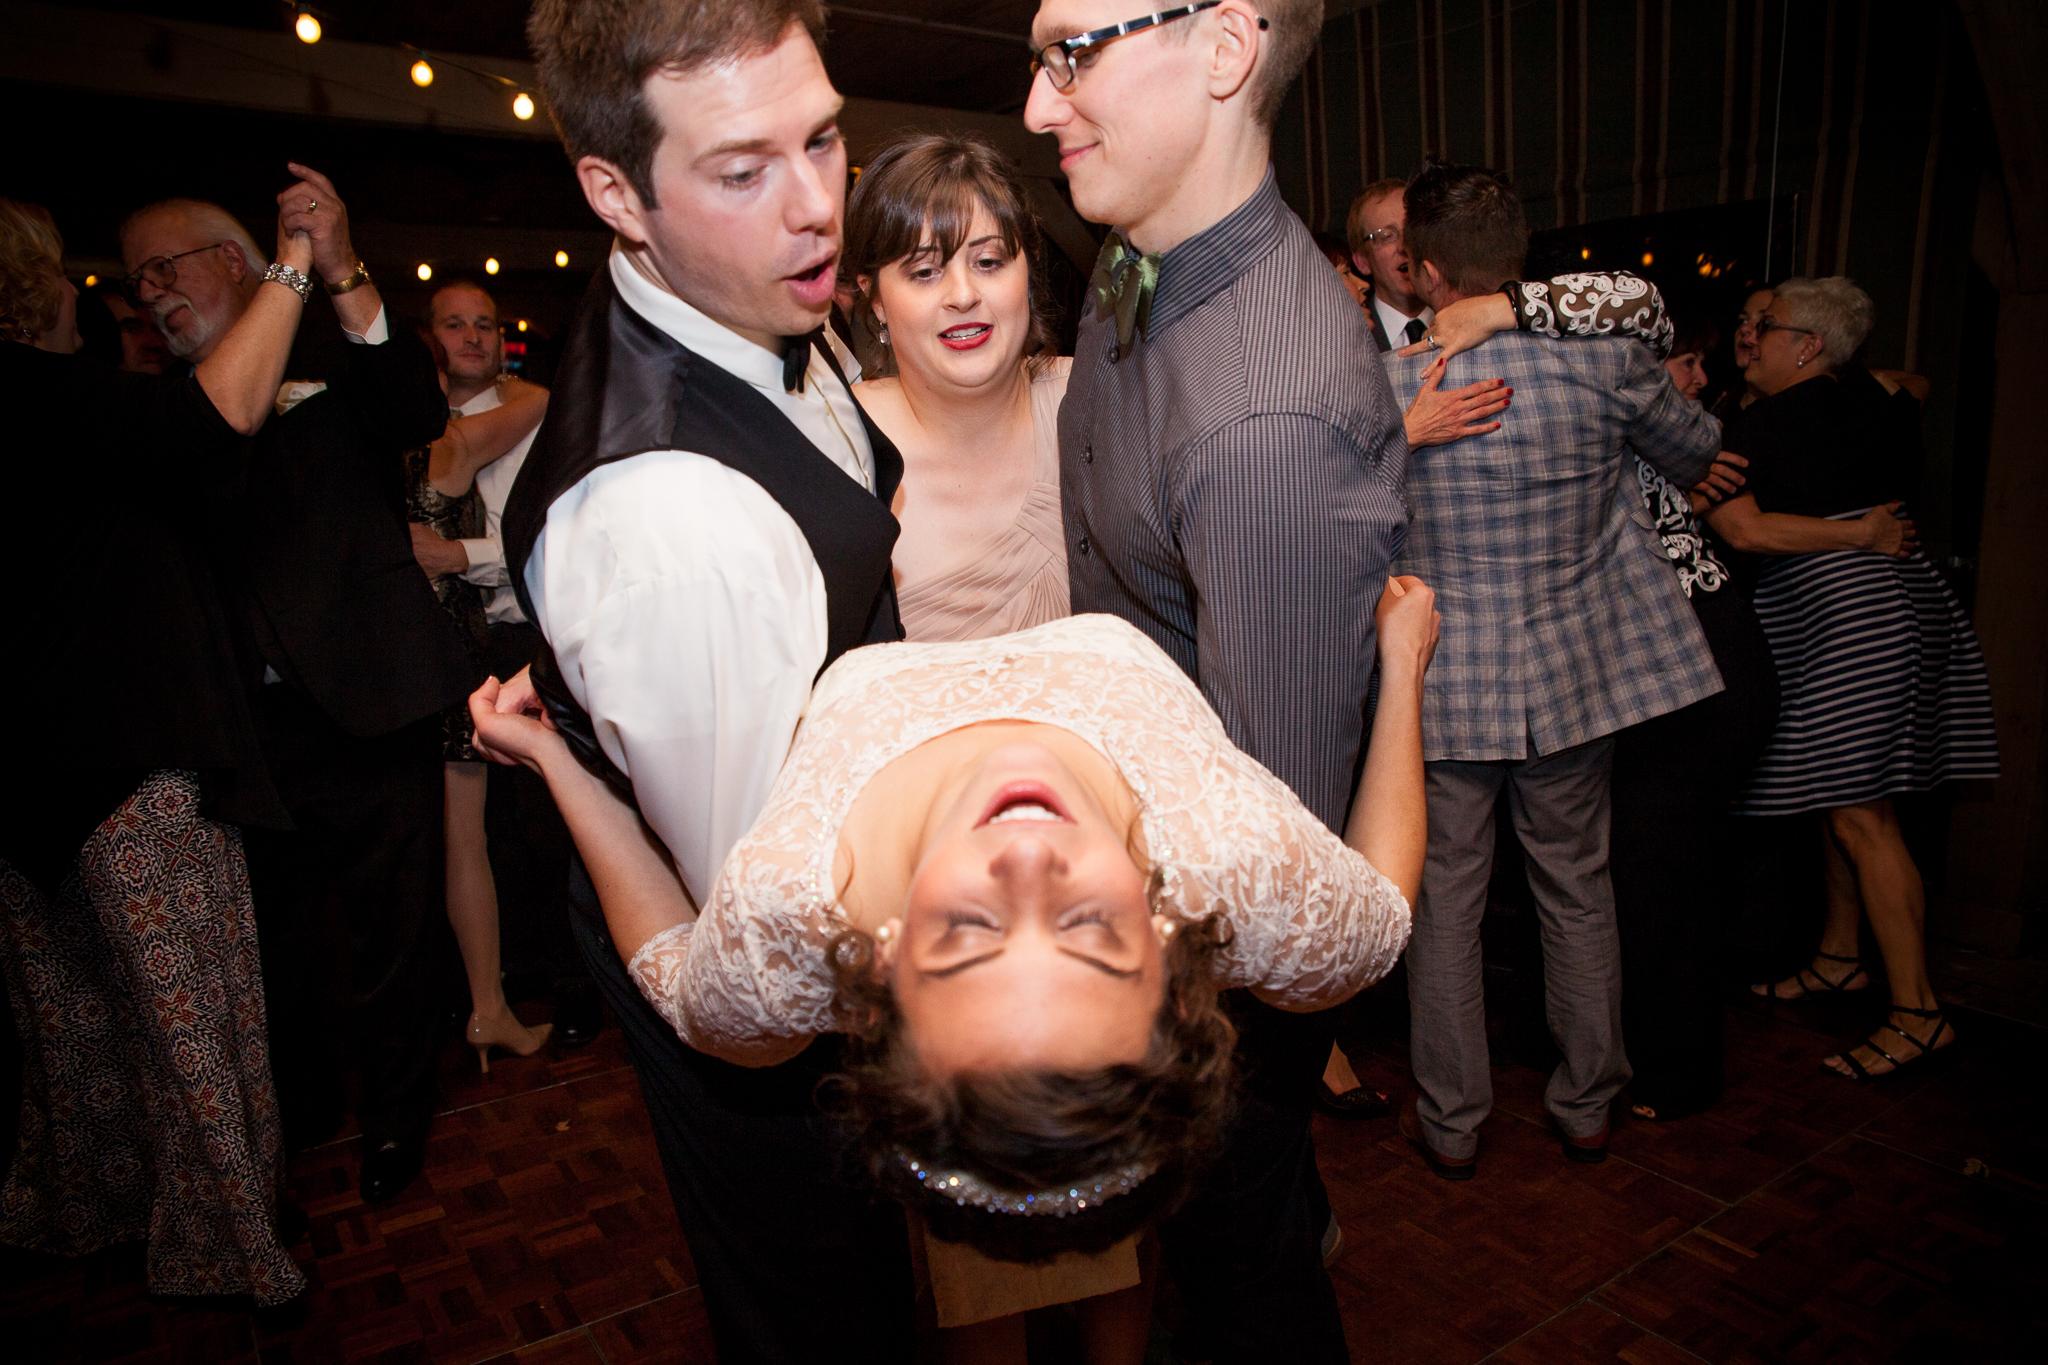 camuglia-whomstudio-chelsea_and_andy-nycphotographer-wedding-brooklyn-buffalo-timberlodge-156-0999.jpg